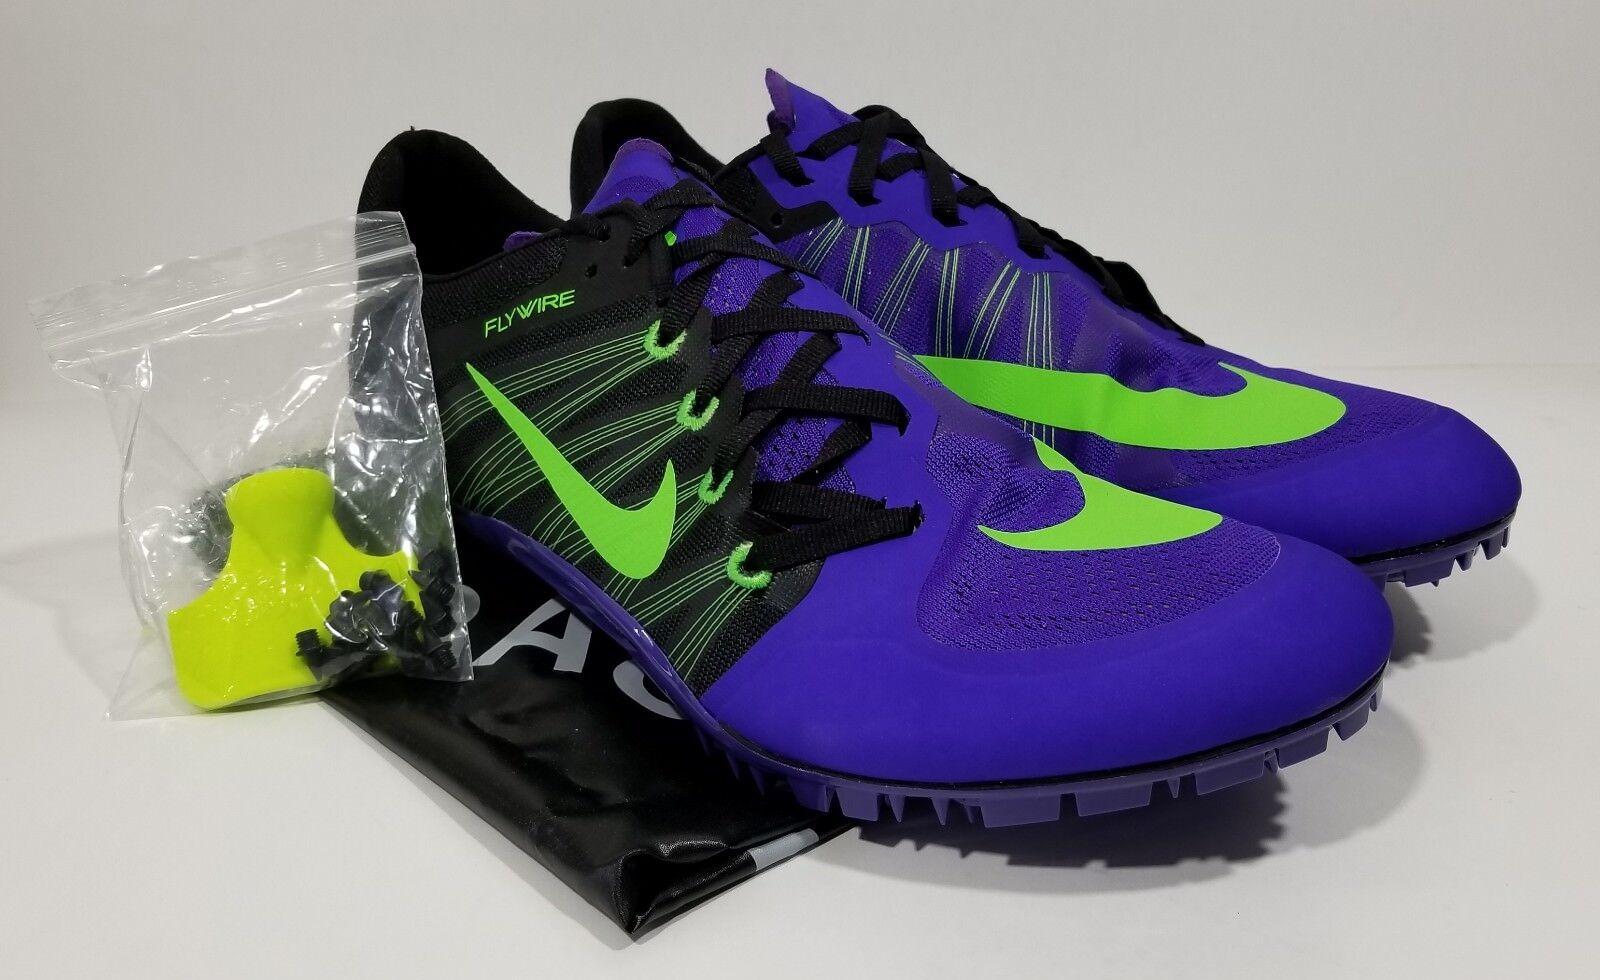 Nike Zoom JA Fly 2 Mens Track & Field Spikes Purple Black Comfortable best-selling model of the brand